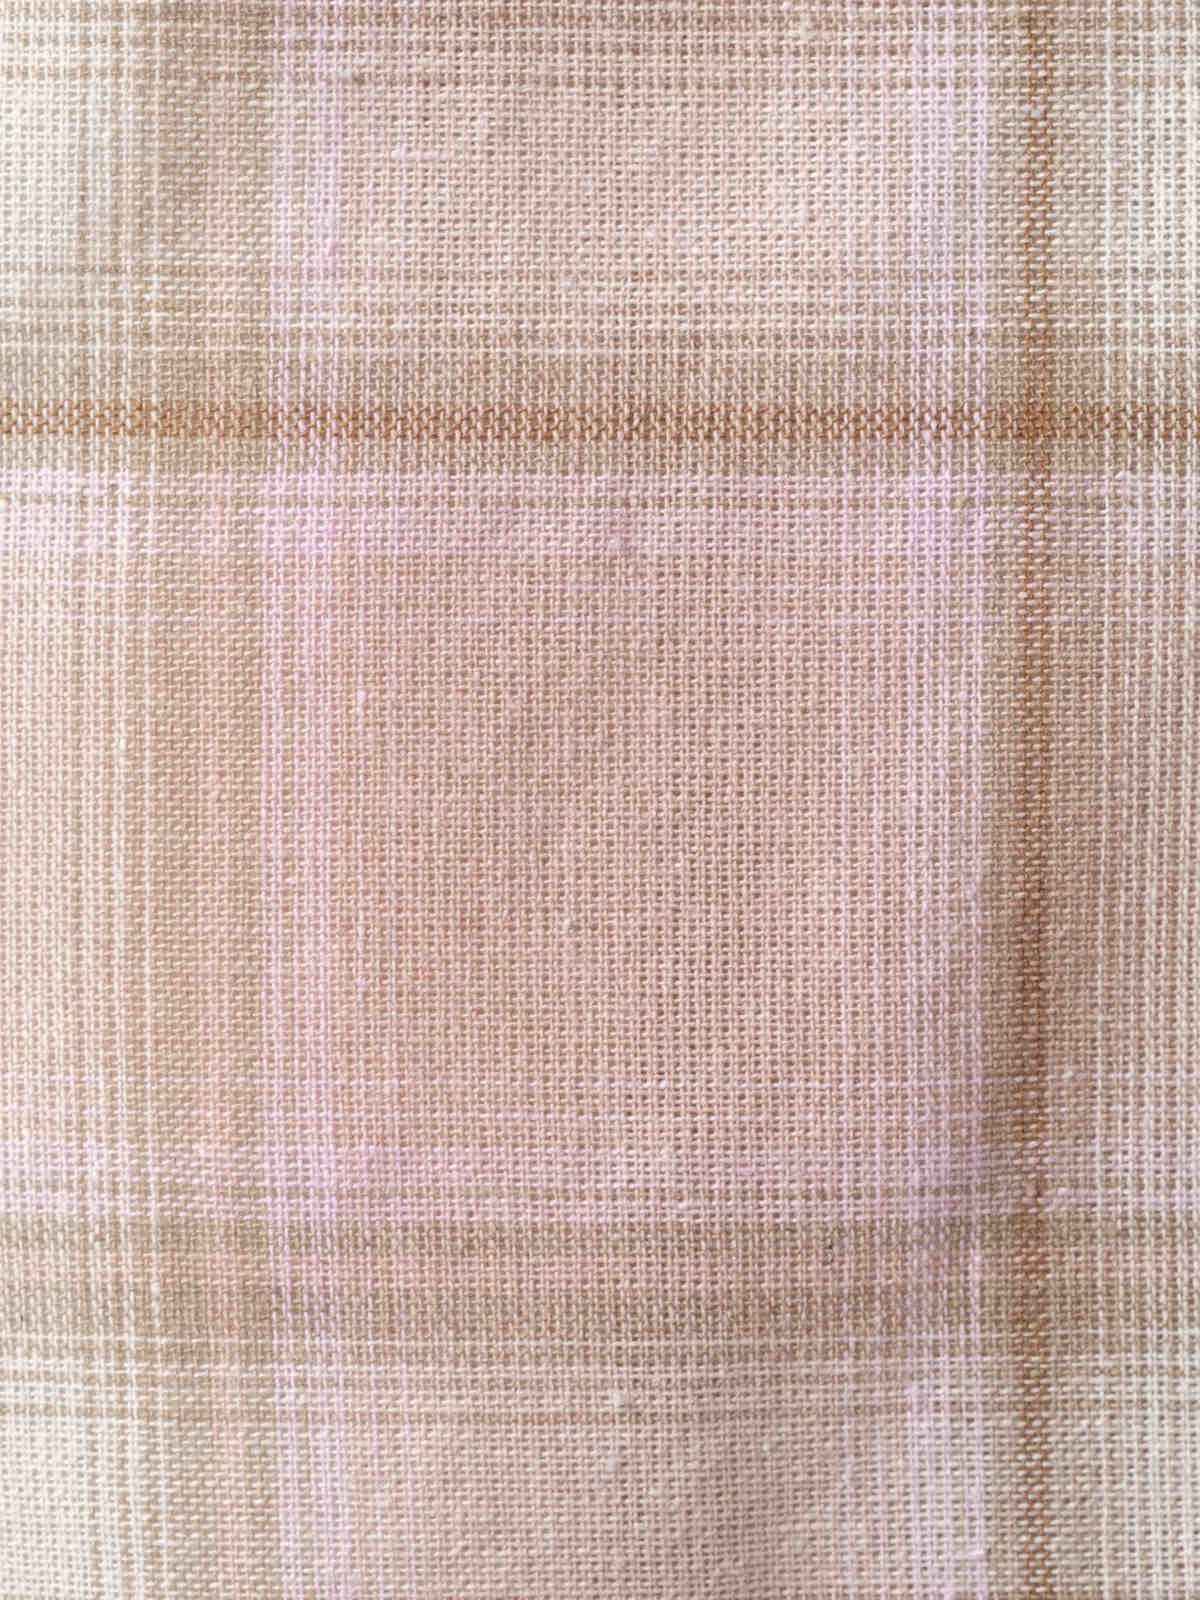 Camisa mujer cuadros bicolor Rosa